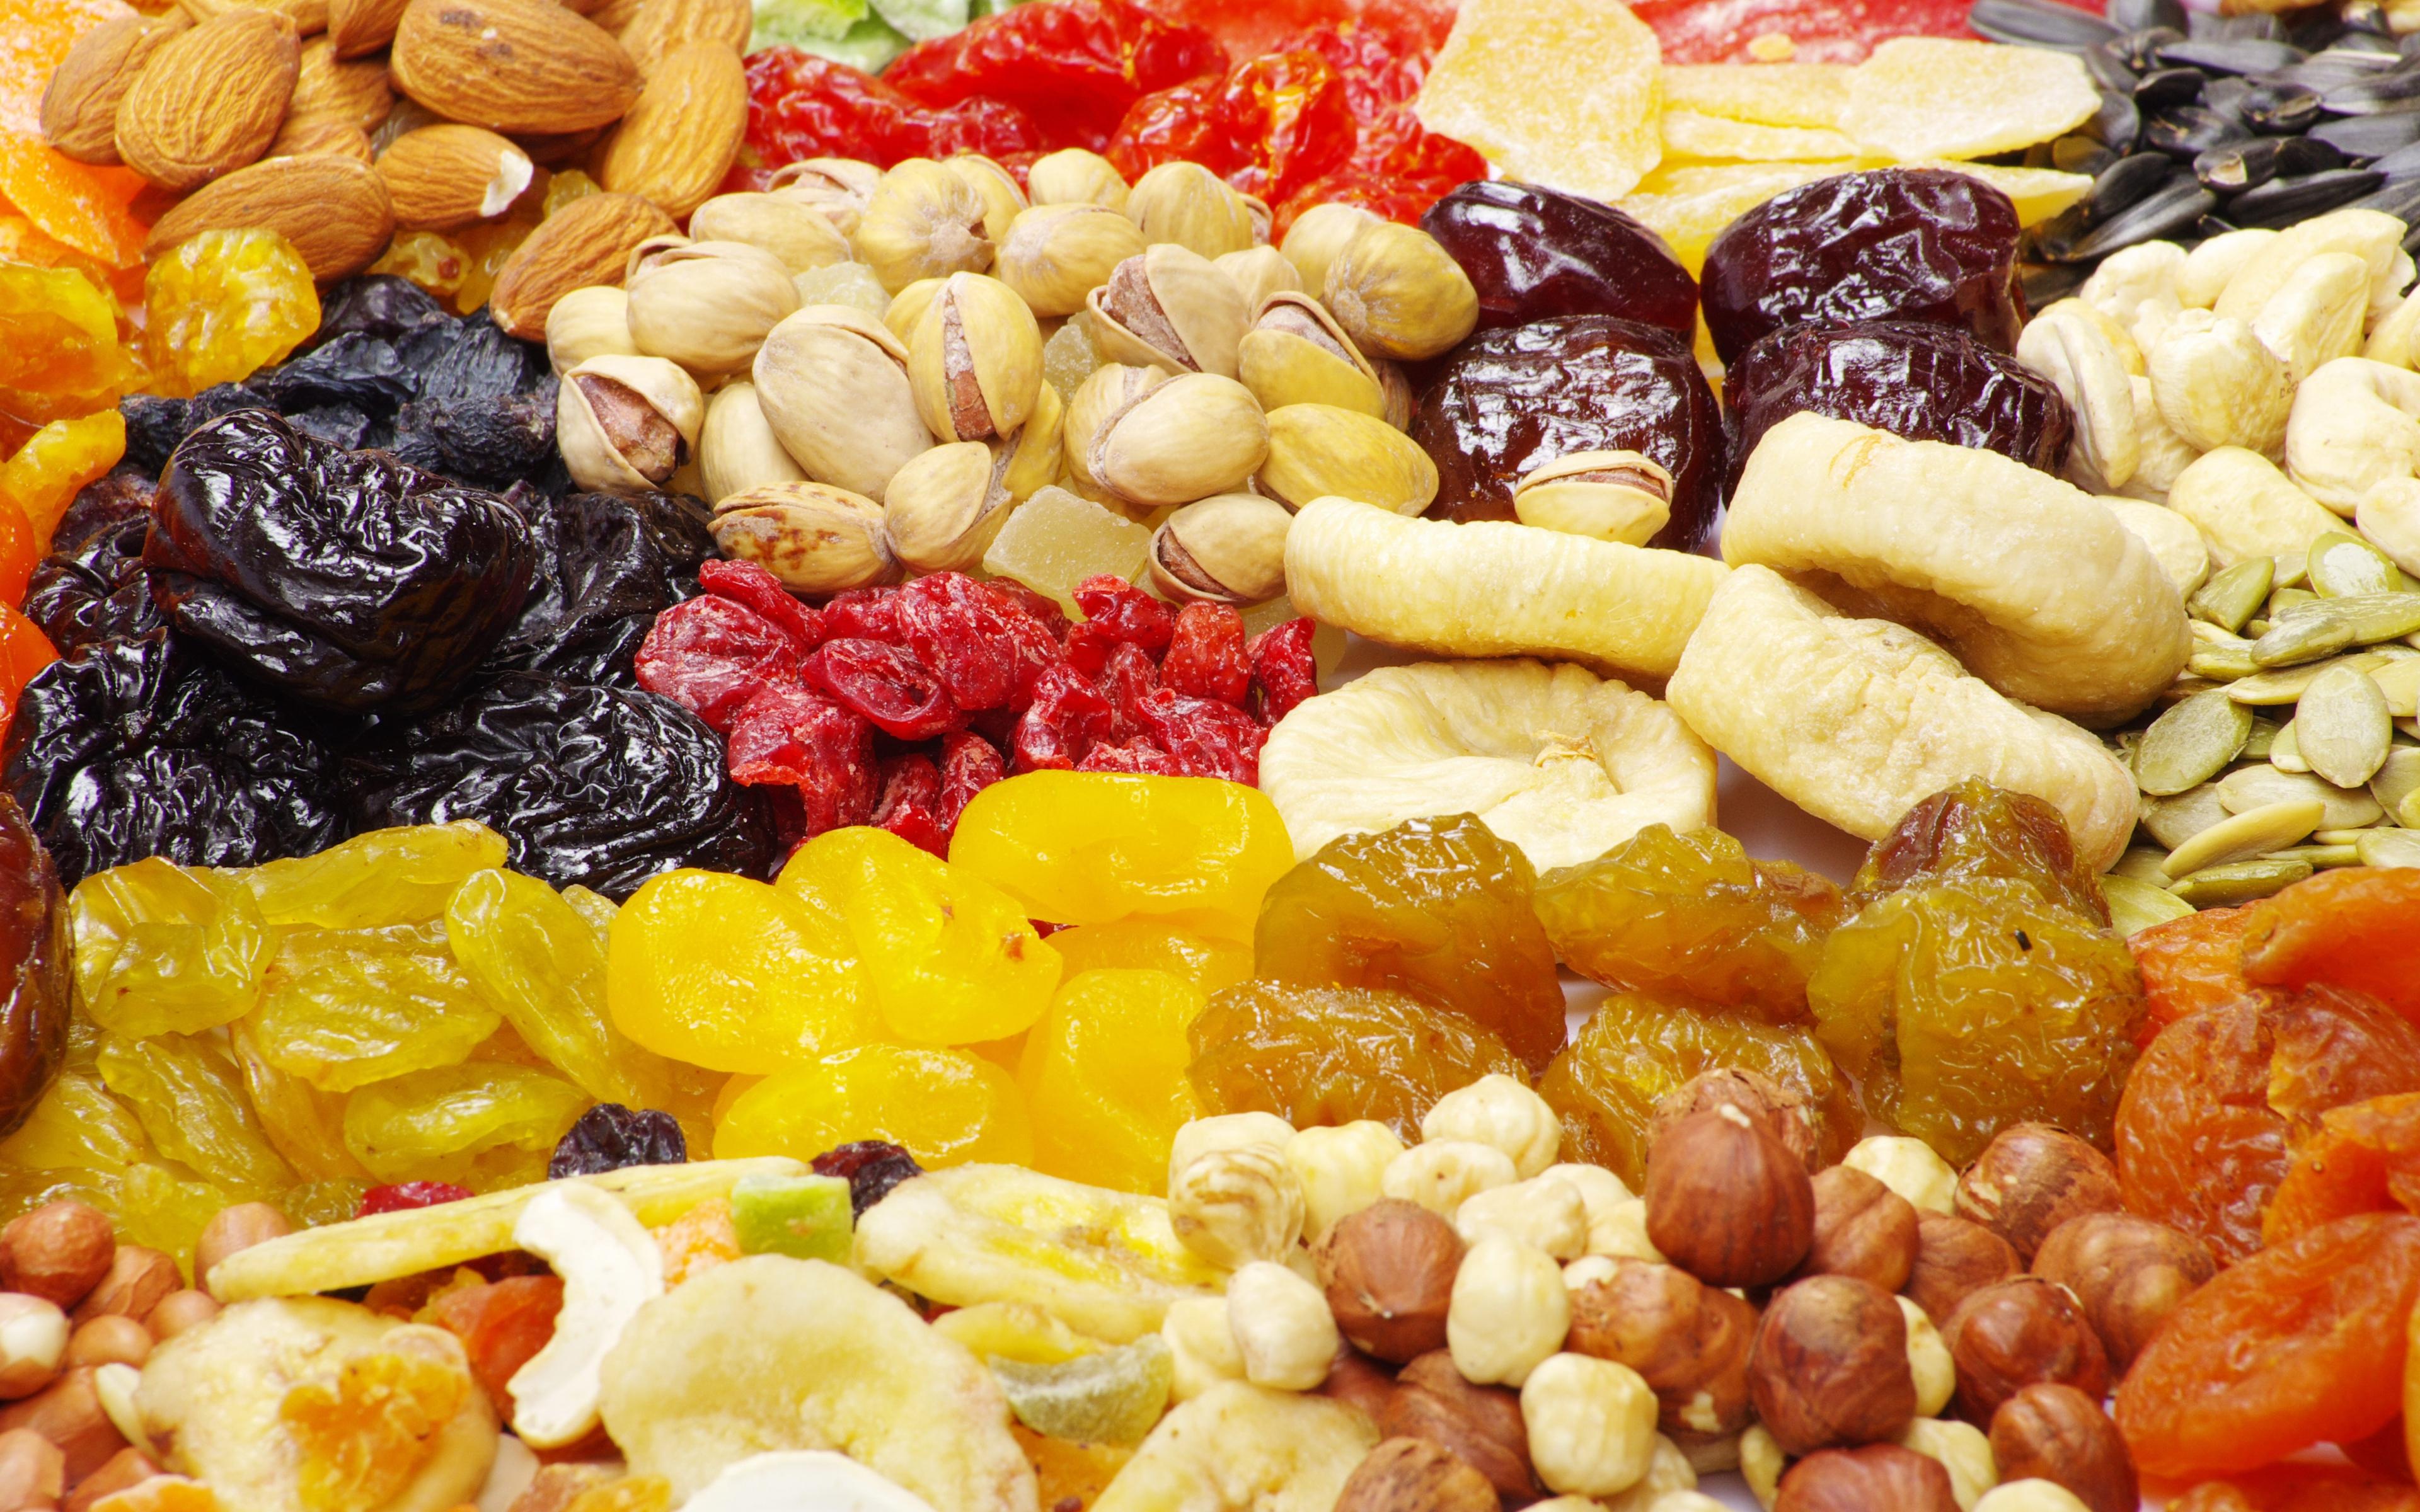 Dry Nuts Hd Free Image: WallpaperSafari